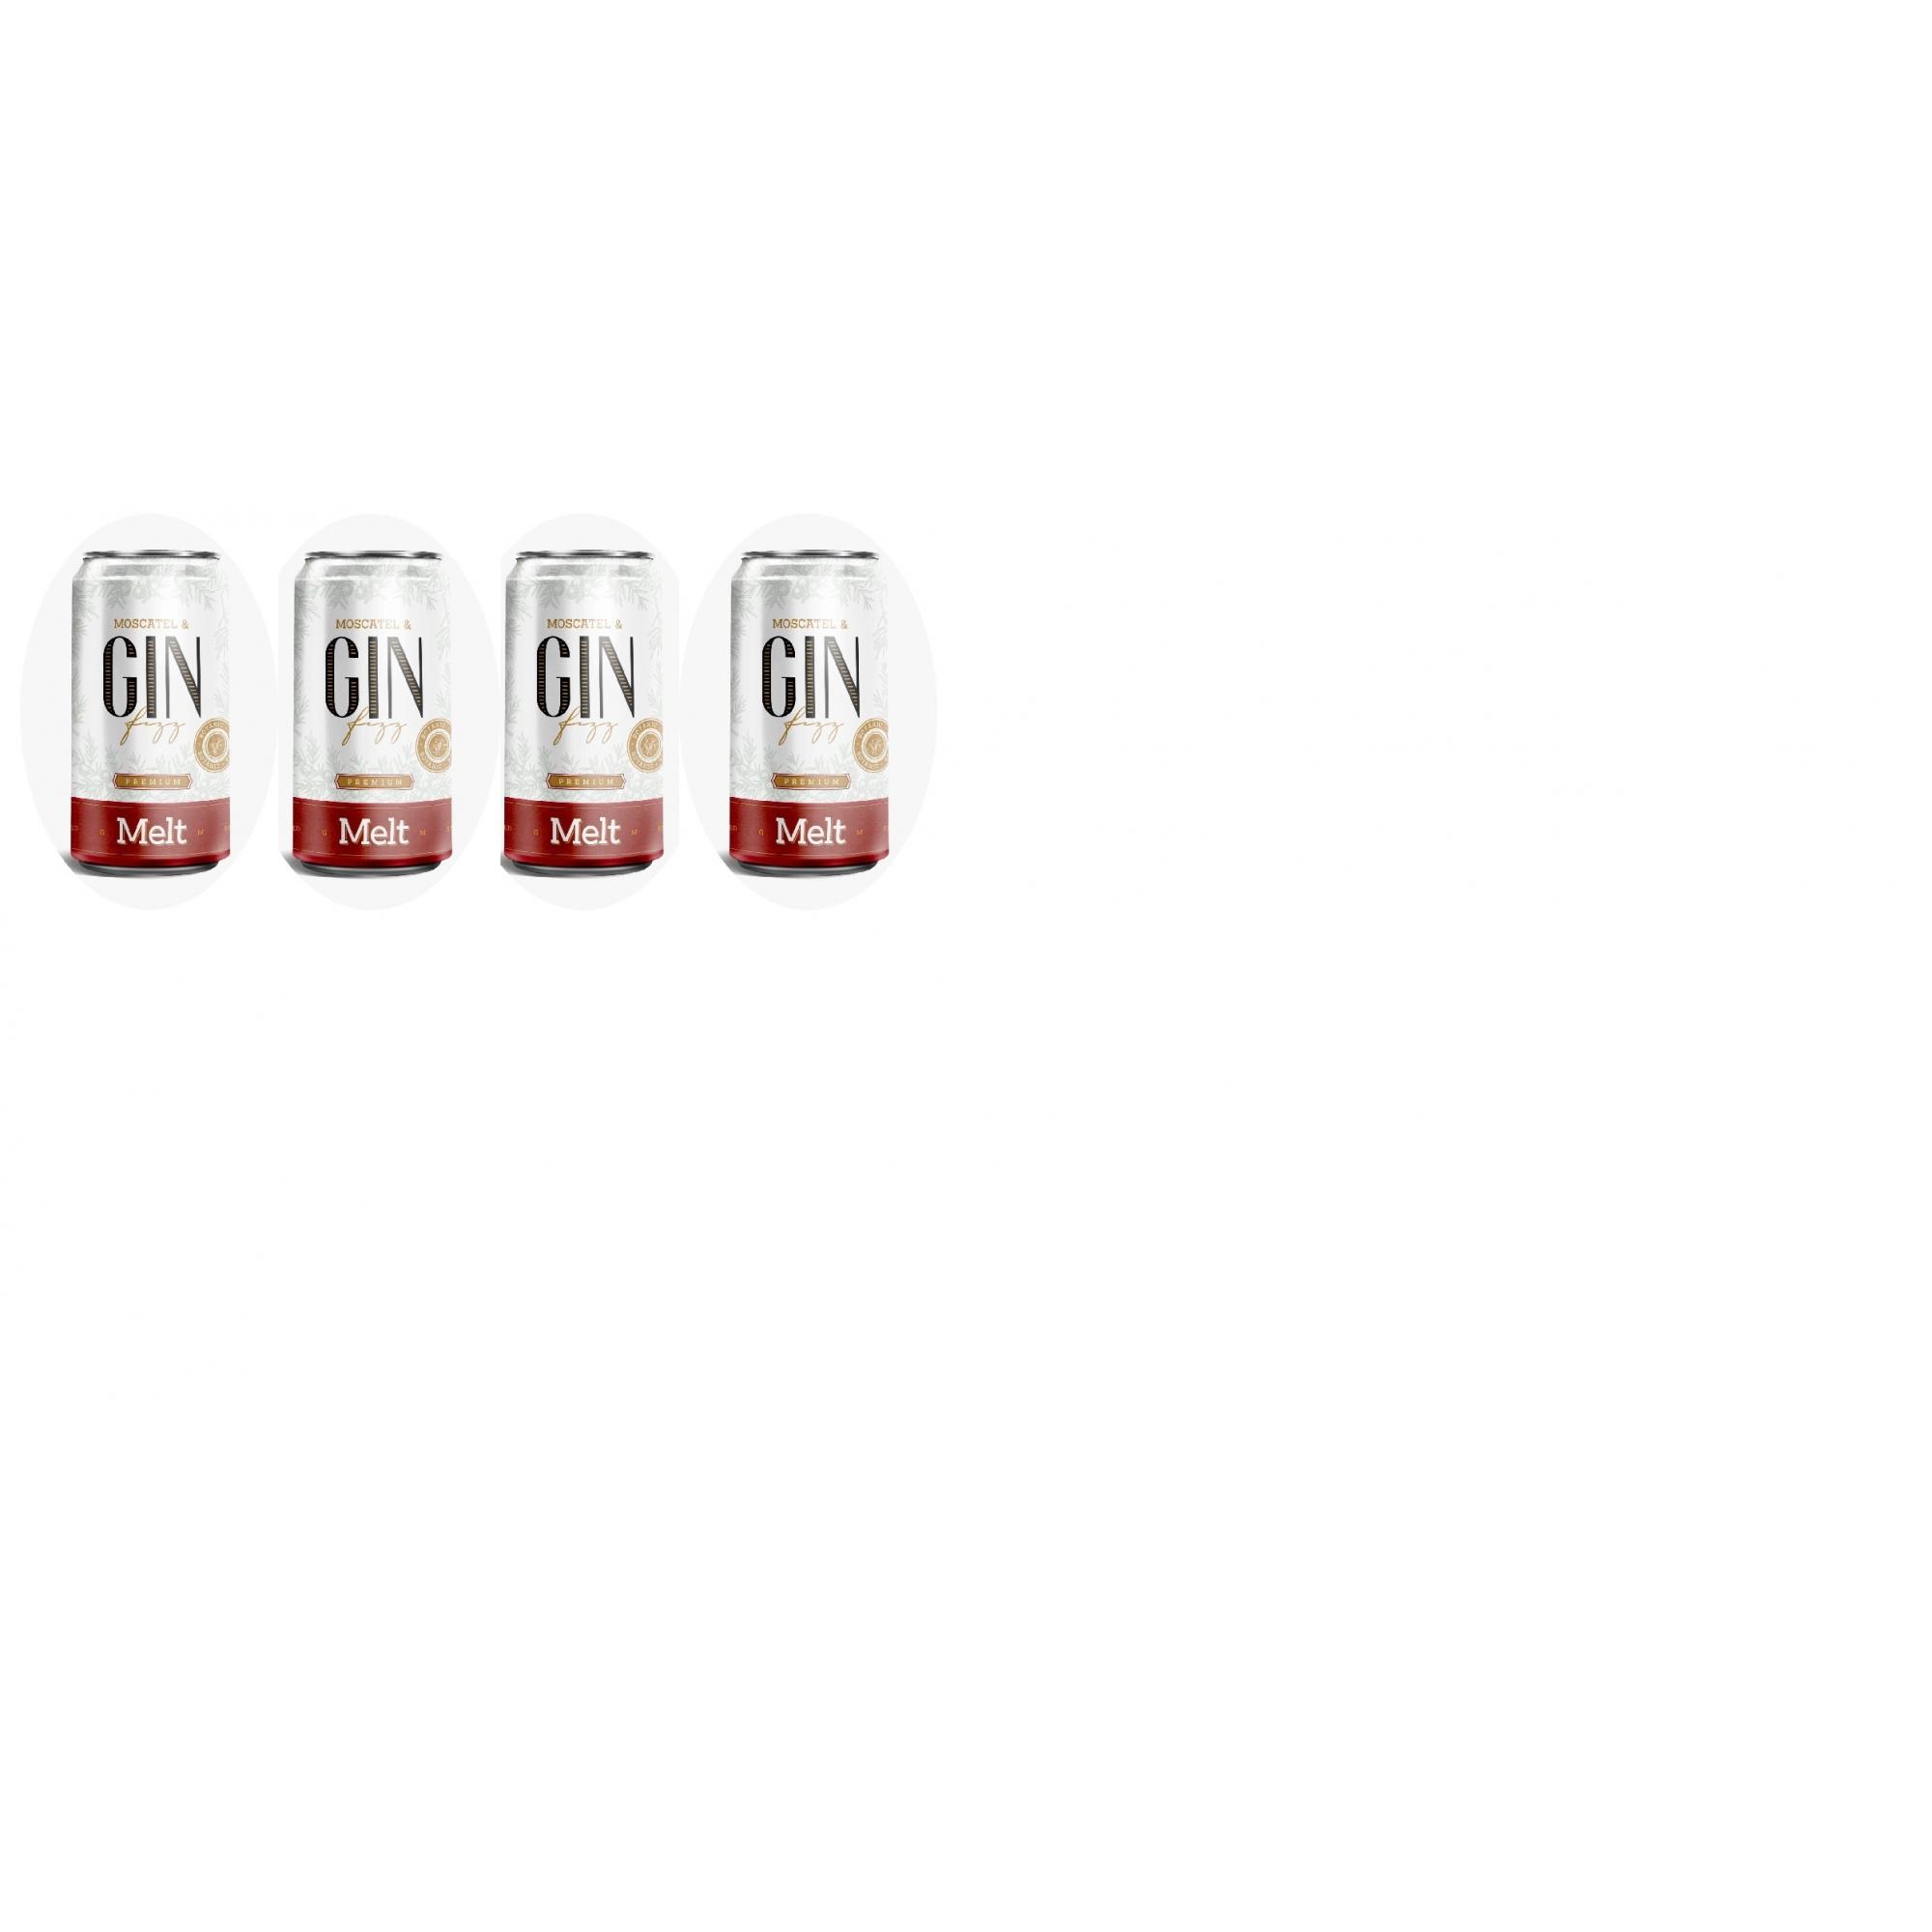 Combo 4 unid. Melt - Moscatel & Gin Fizz lata  - 269ml  - DQ Comércio